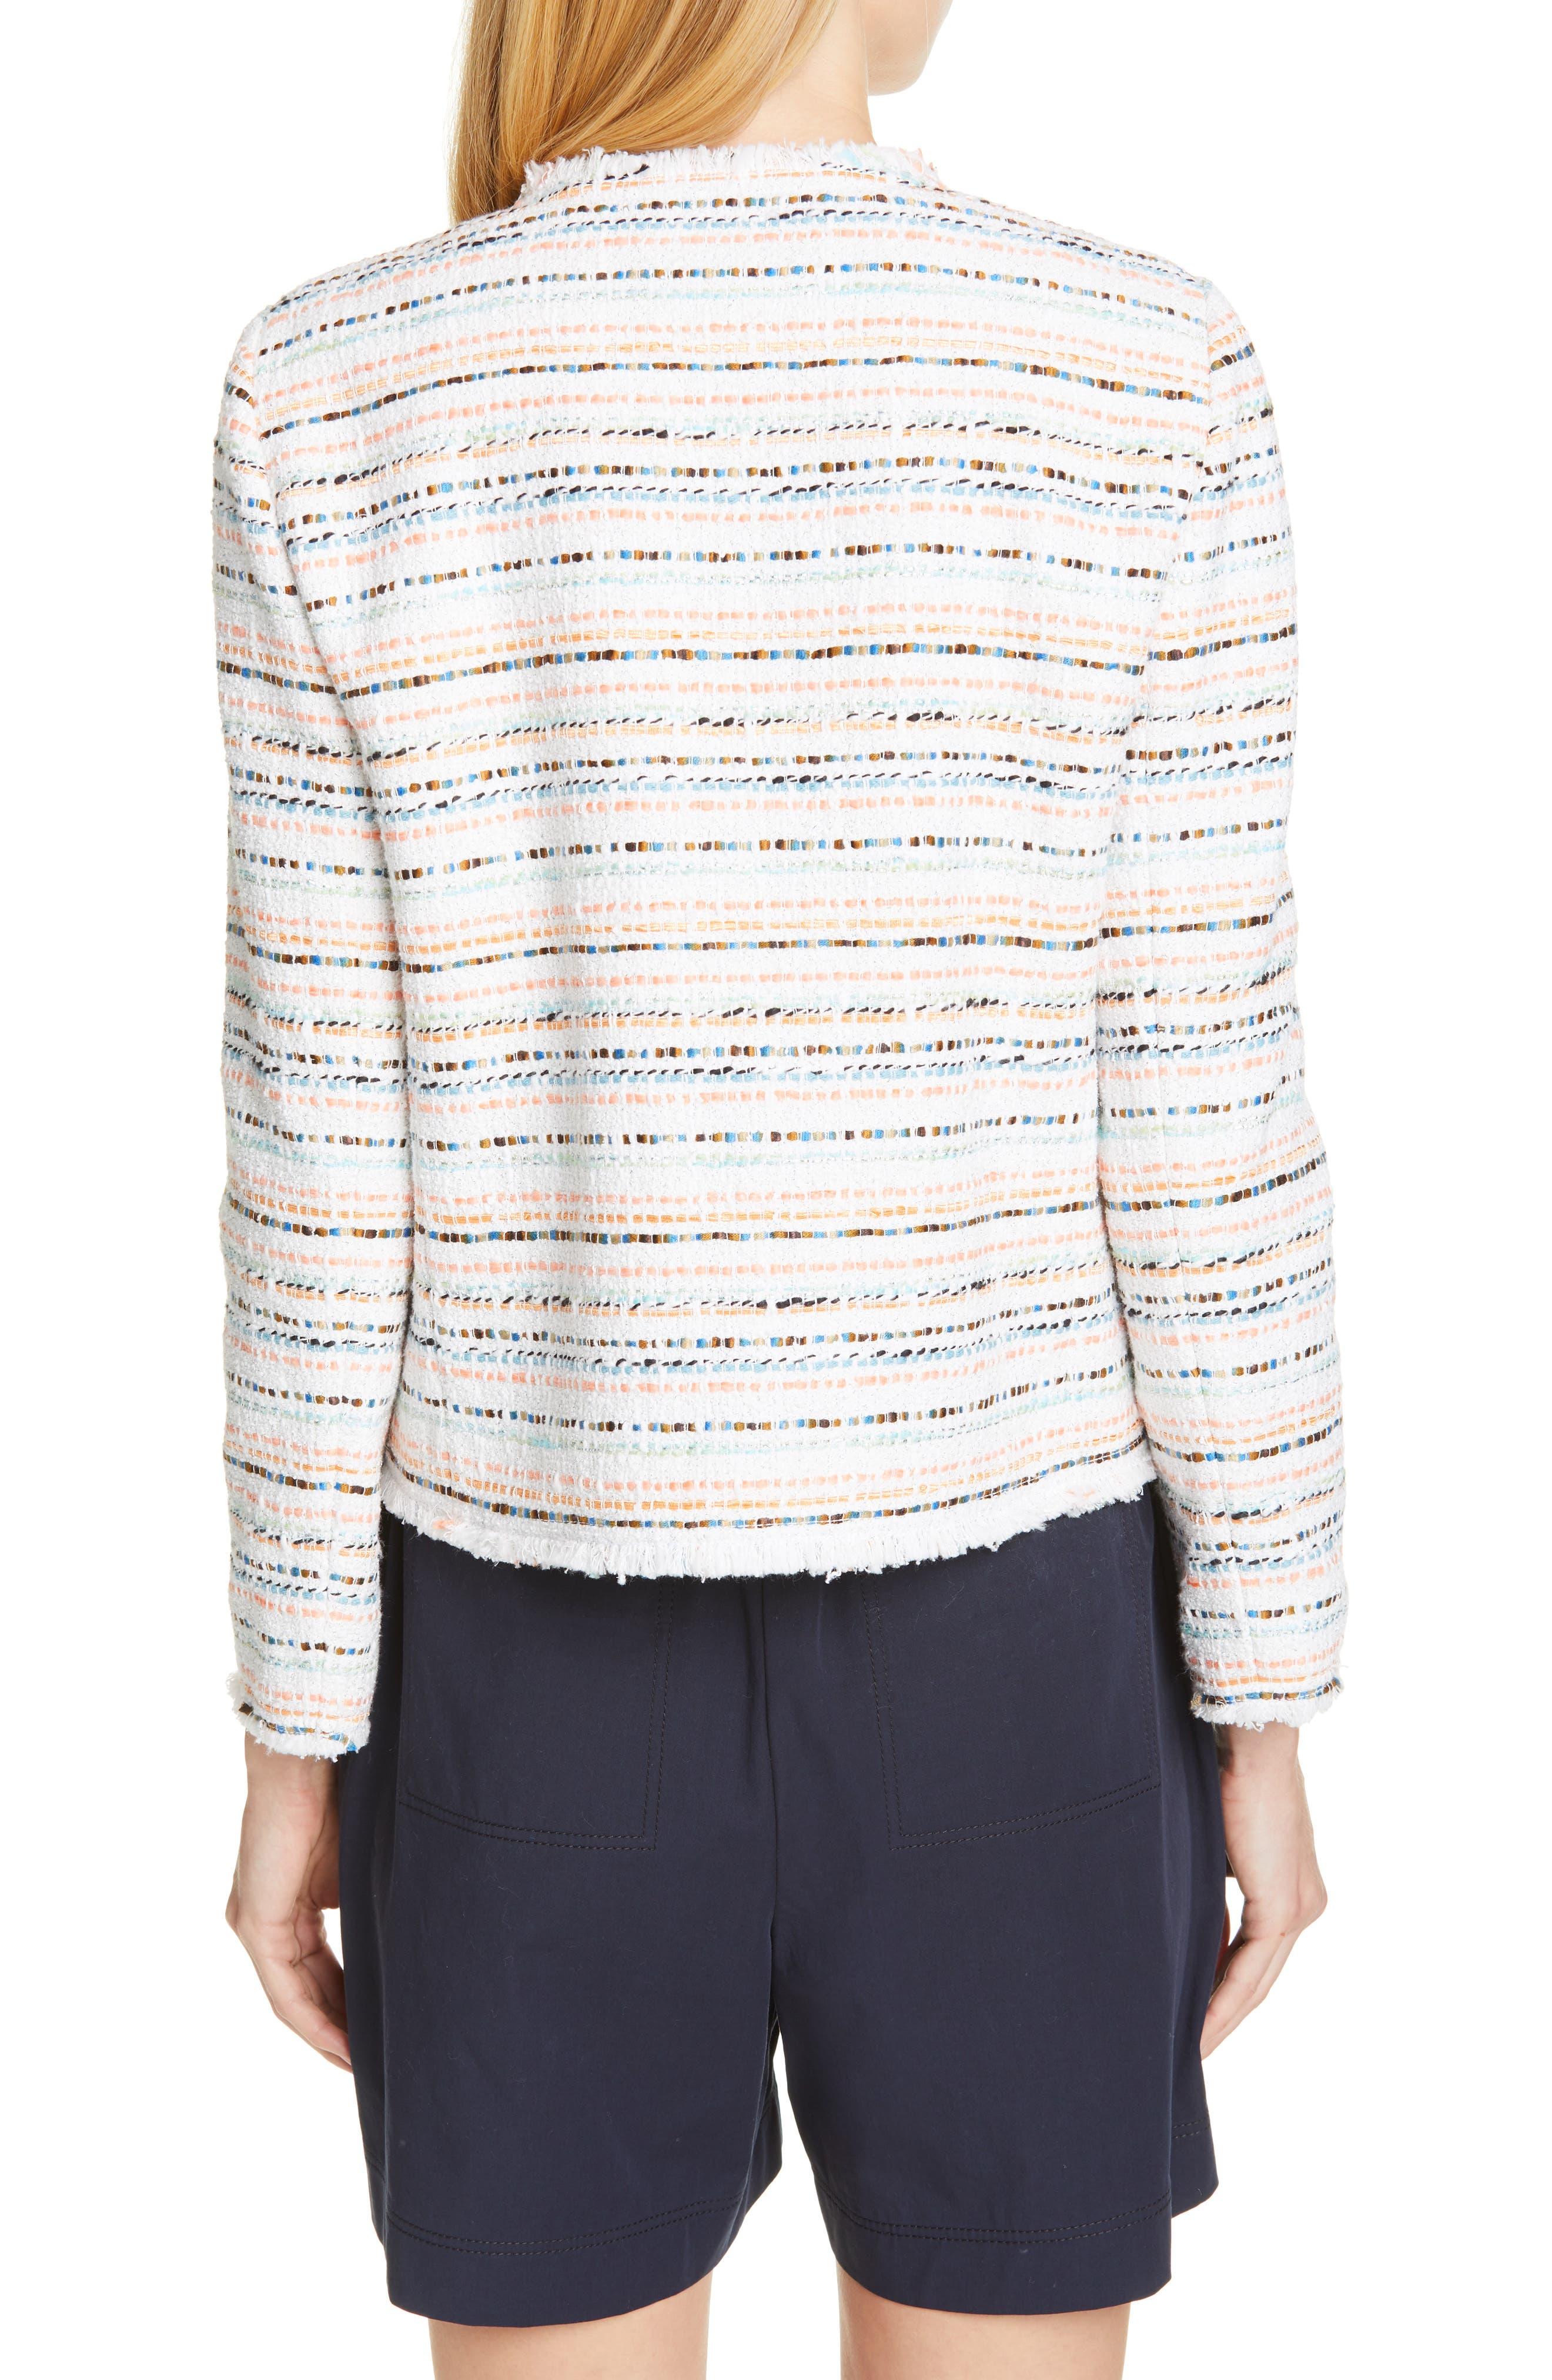 LAFAYETTE 148 NEW YORK Albano Jacket, Main, color, WHITE MULTI